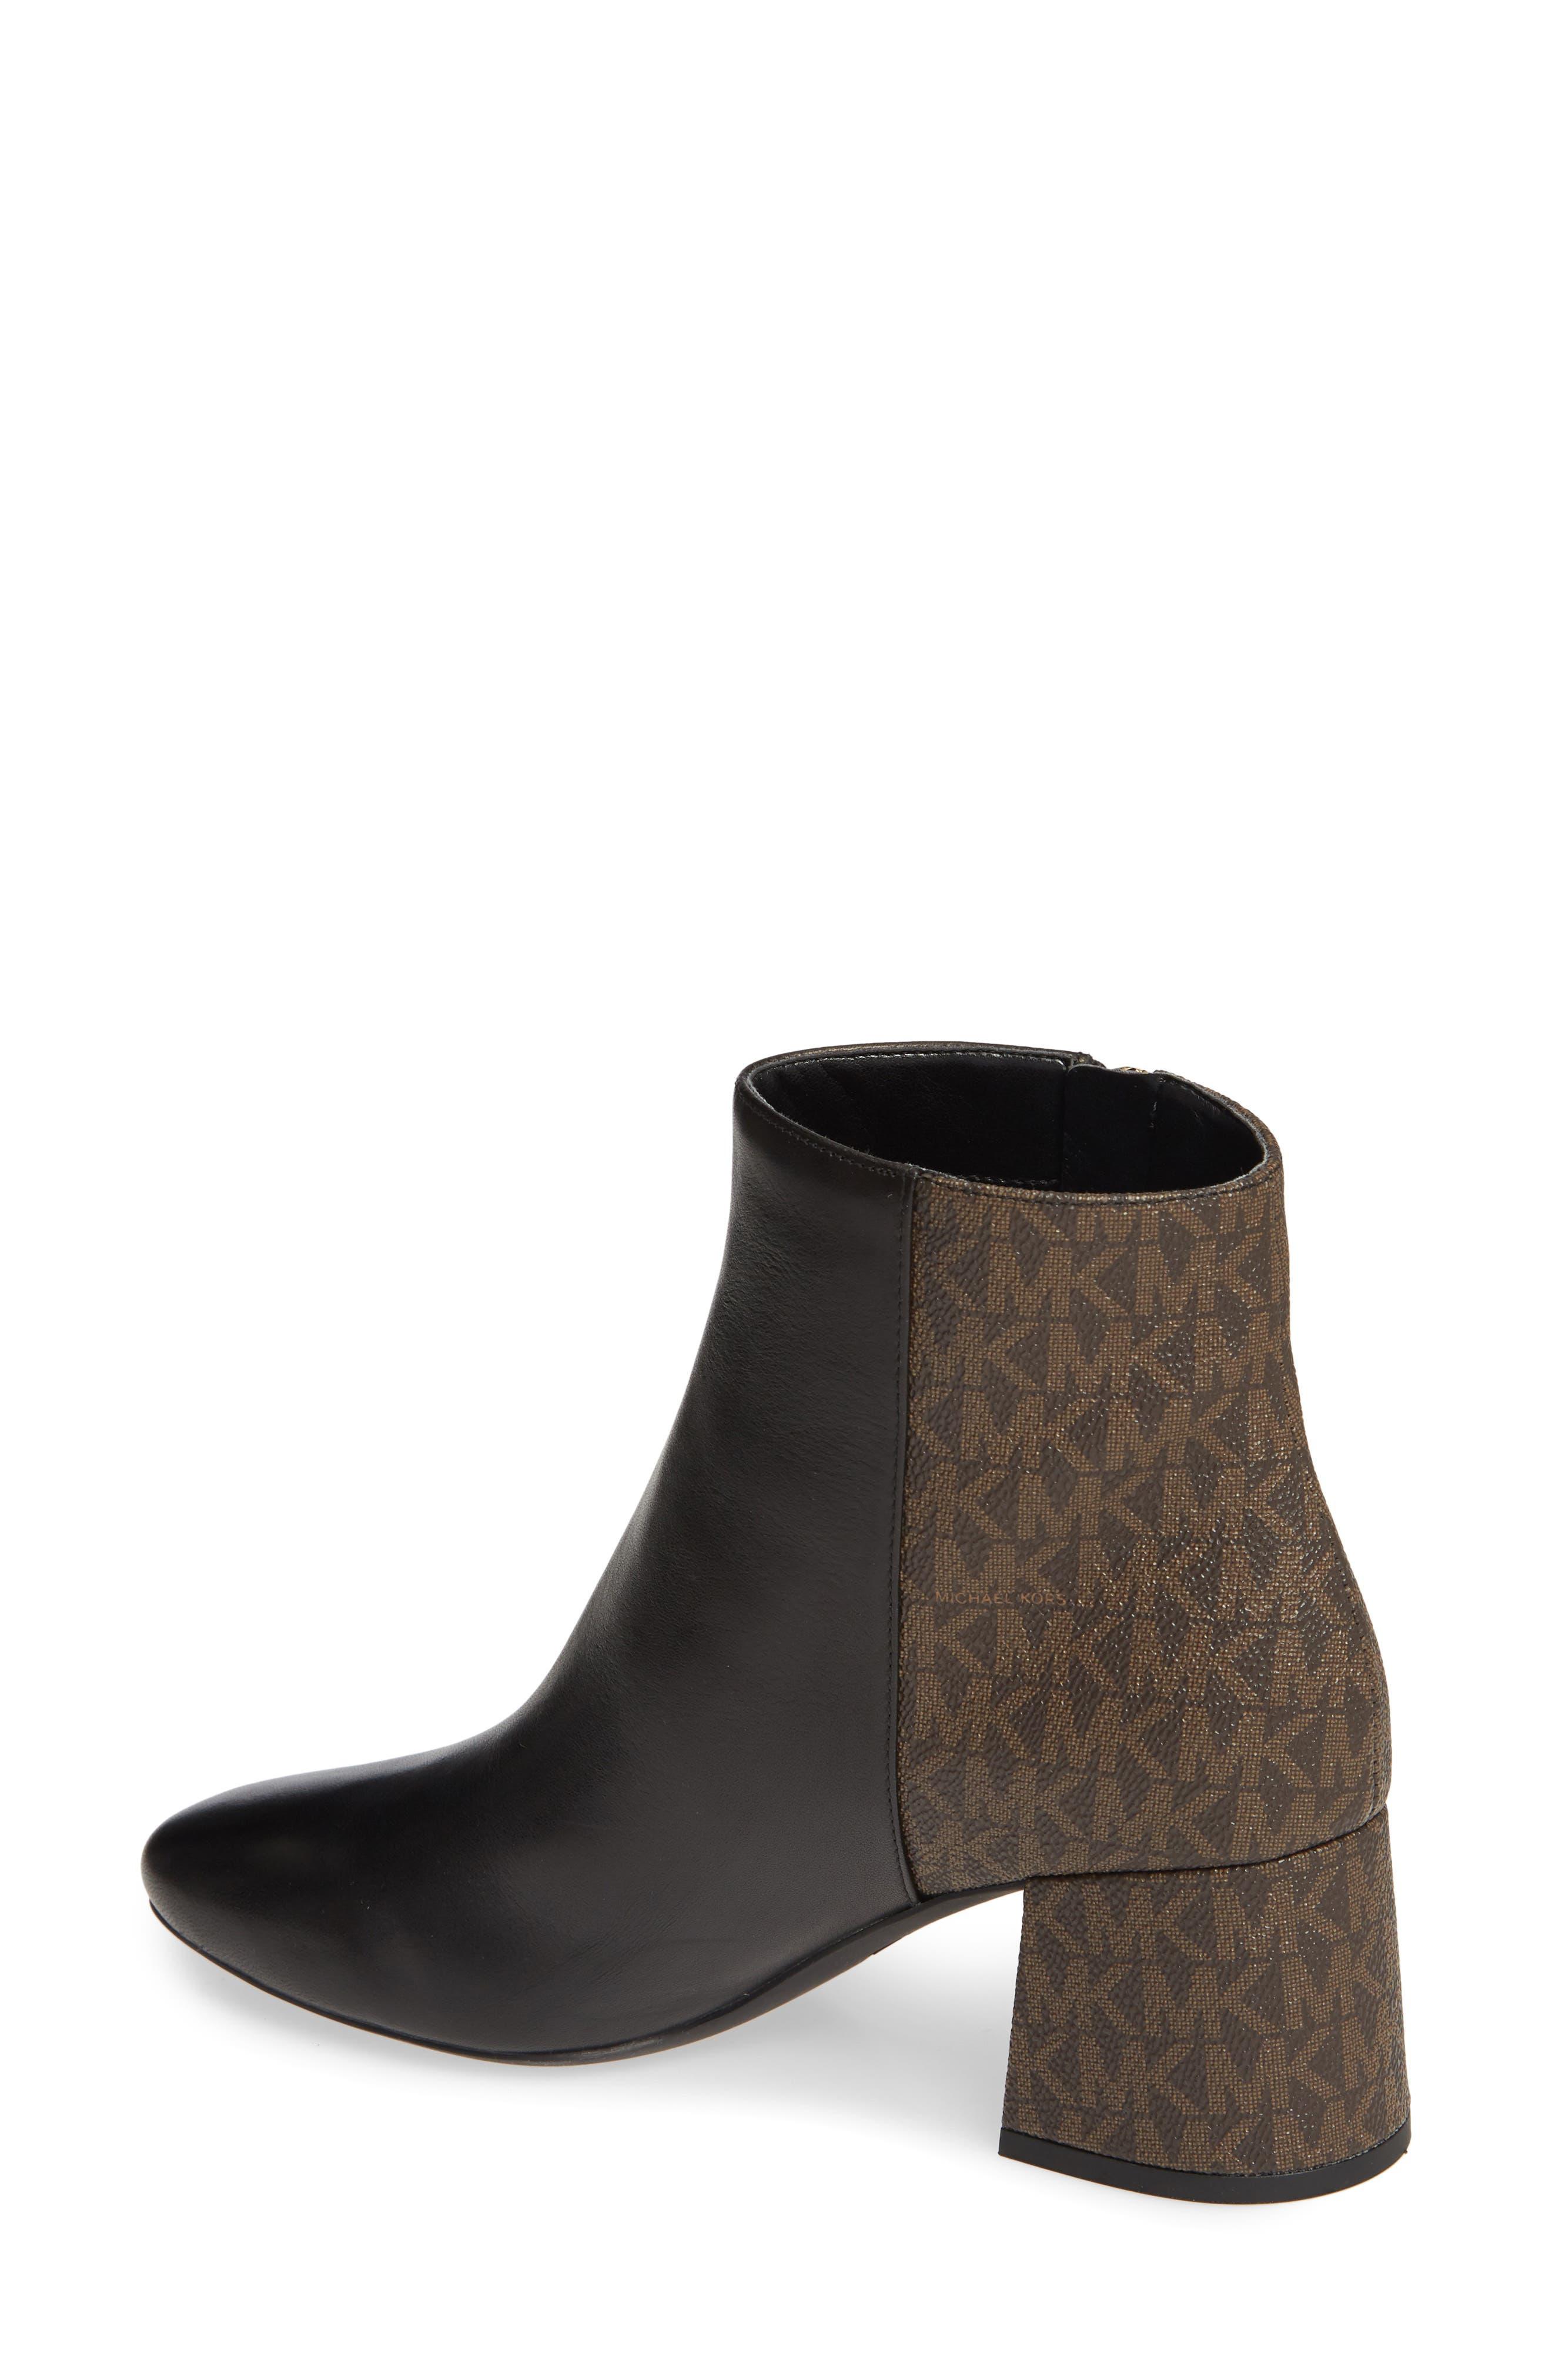 Women's MICHAEL Michael Kors Booties & Ankle Boots | Nordstrom